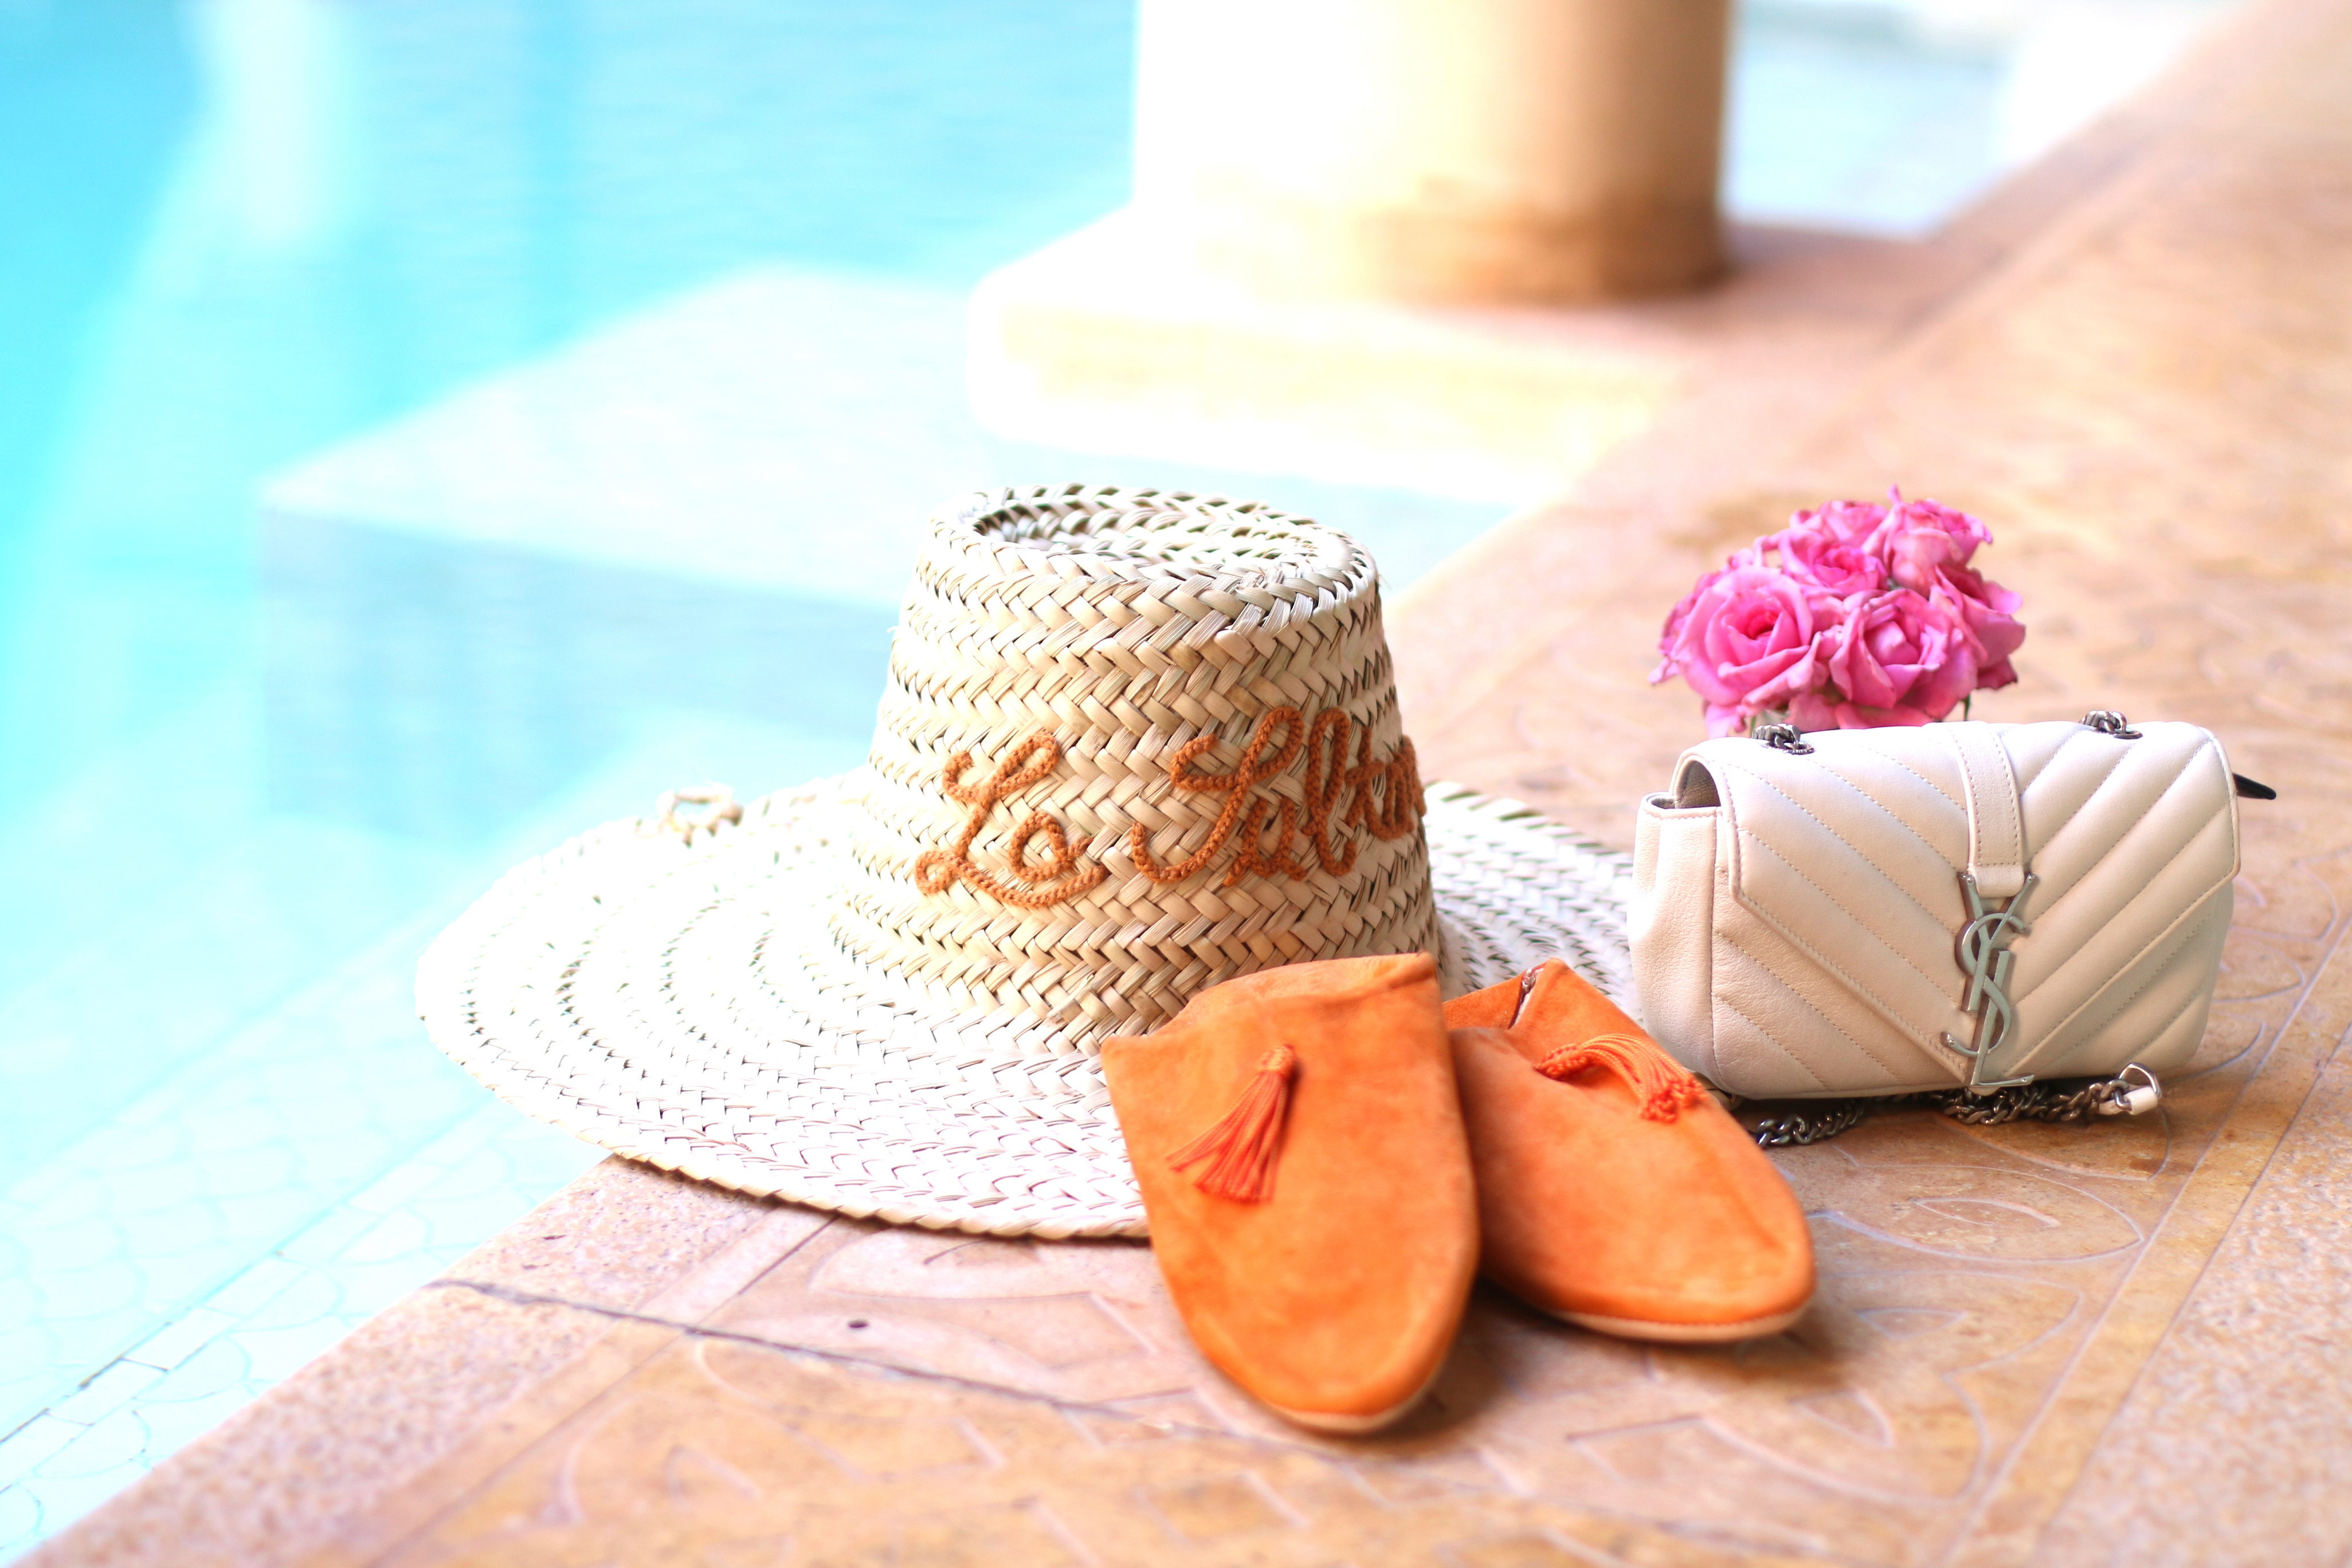 la sultana marrakech hotel review pool vacation travelblog travelblogger marrakesch marrakesh